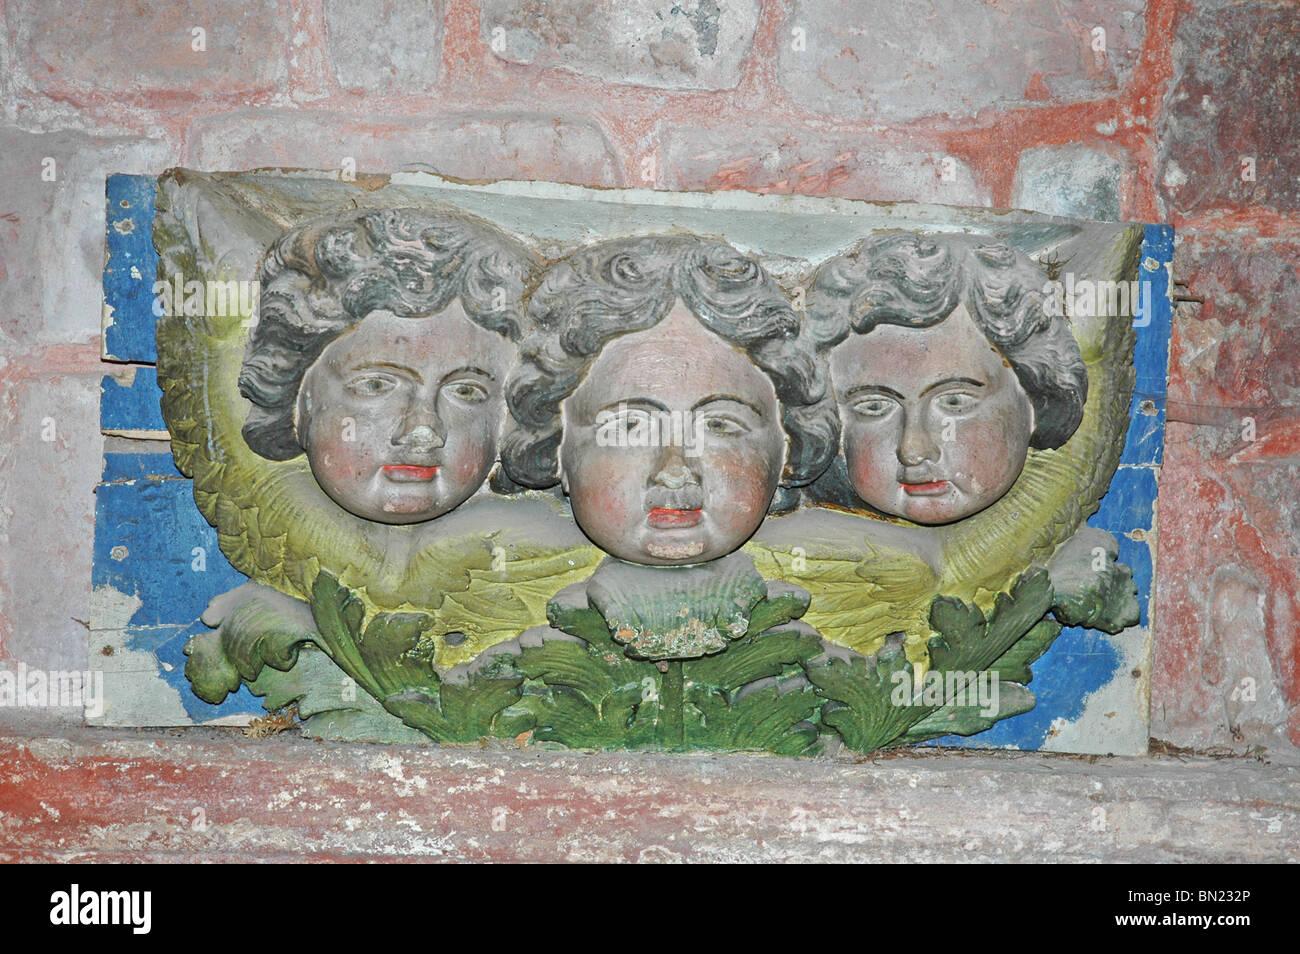 Three Cherubims, sculpted inside the Church of Saint Pierre, Collonges-la-Rouge. - Stock Image